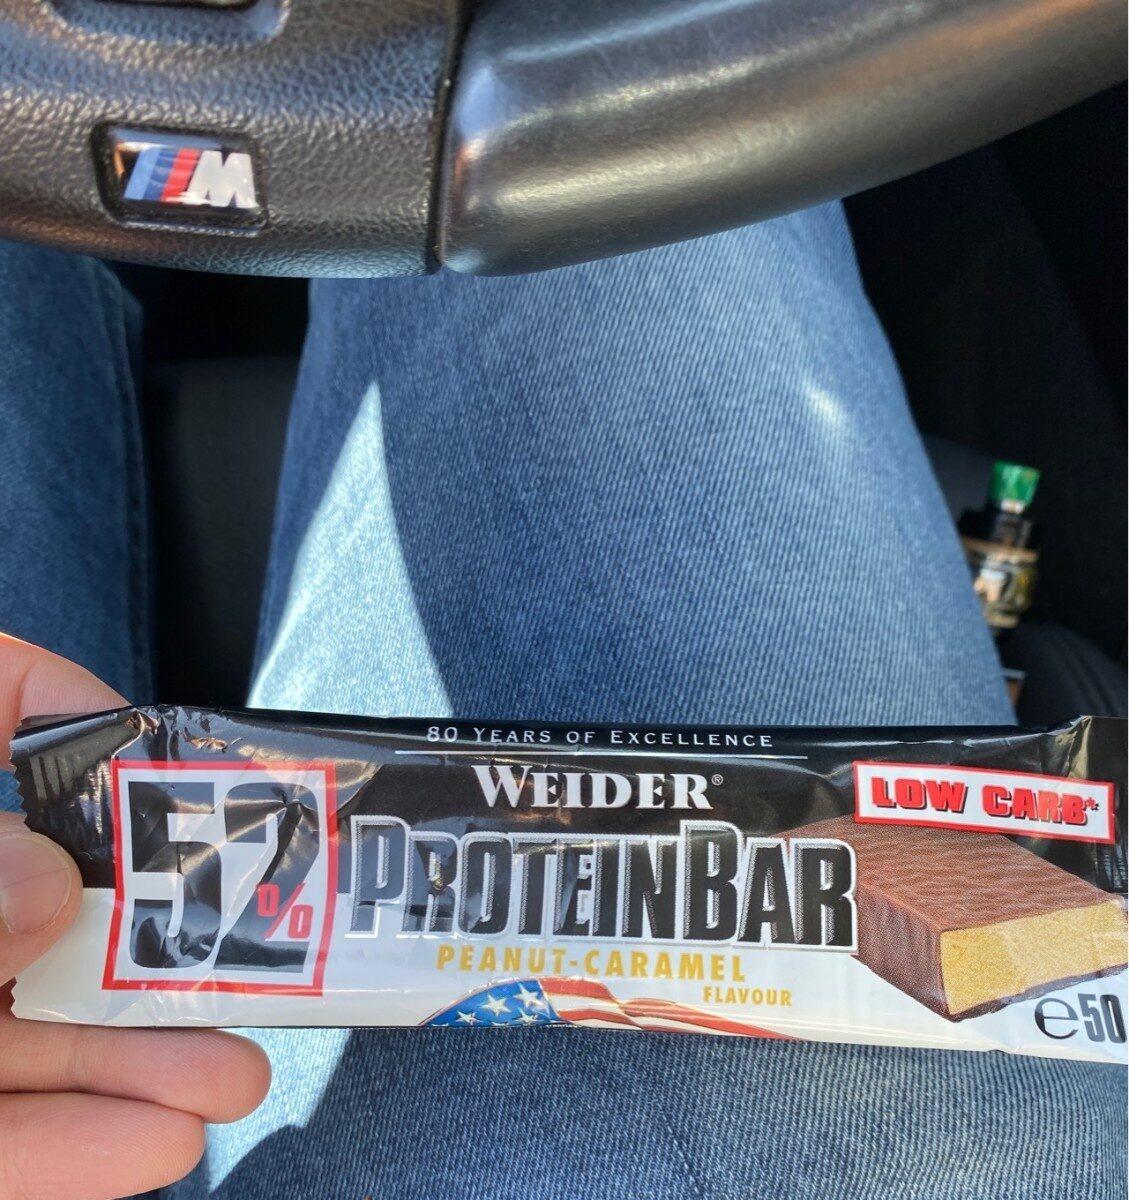 Proteinbar 52%, Peanut Caramel - Product